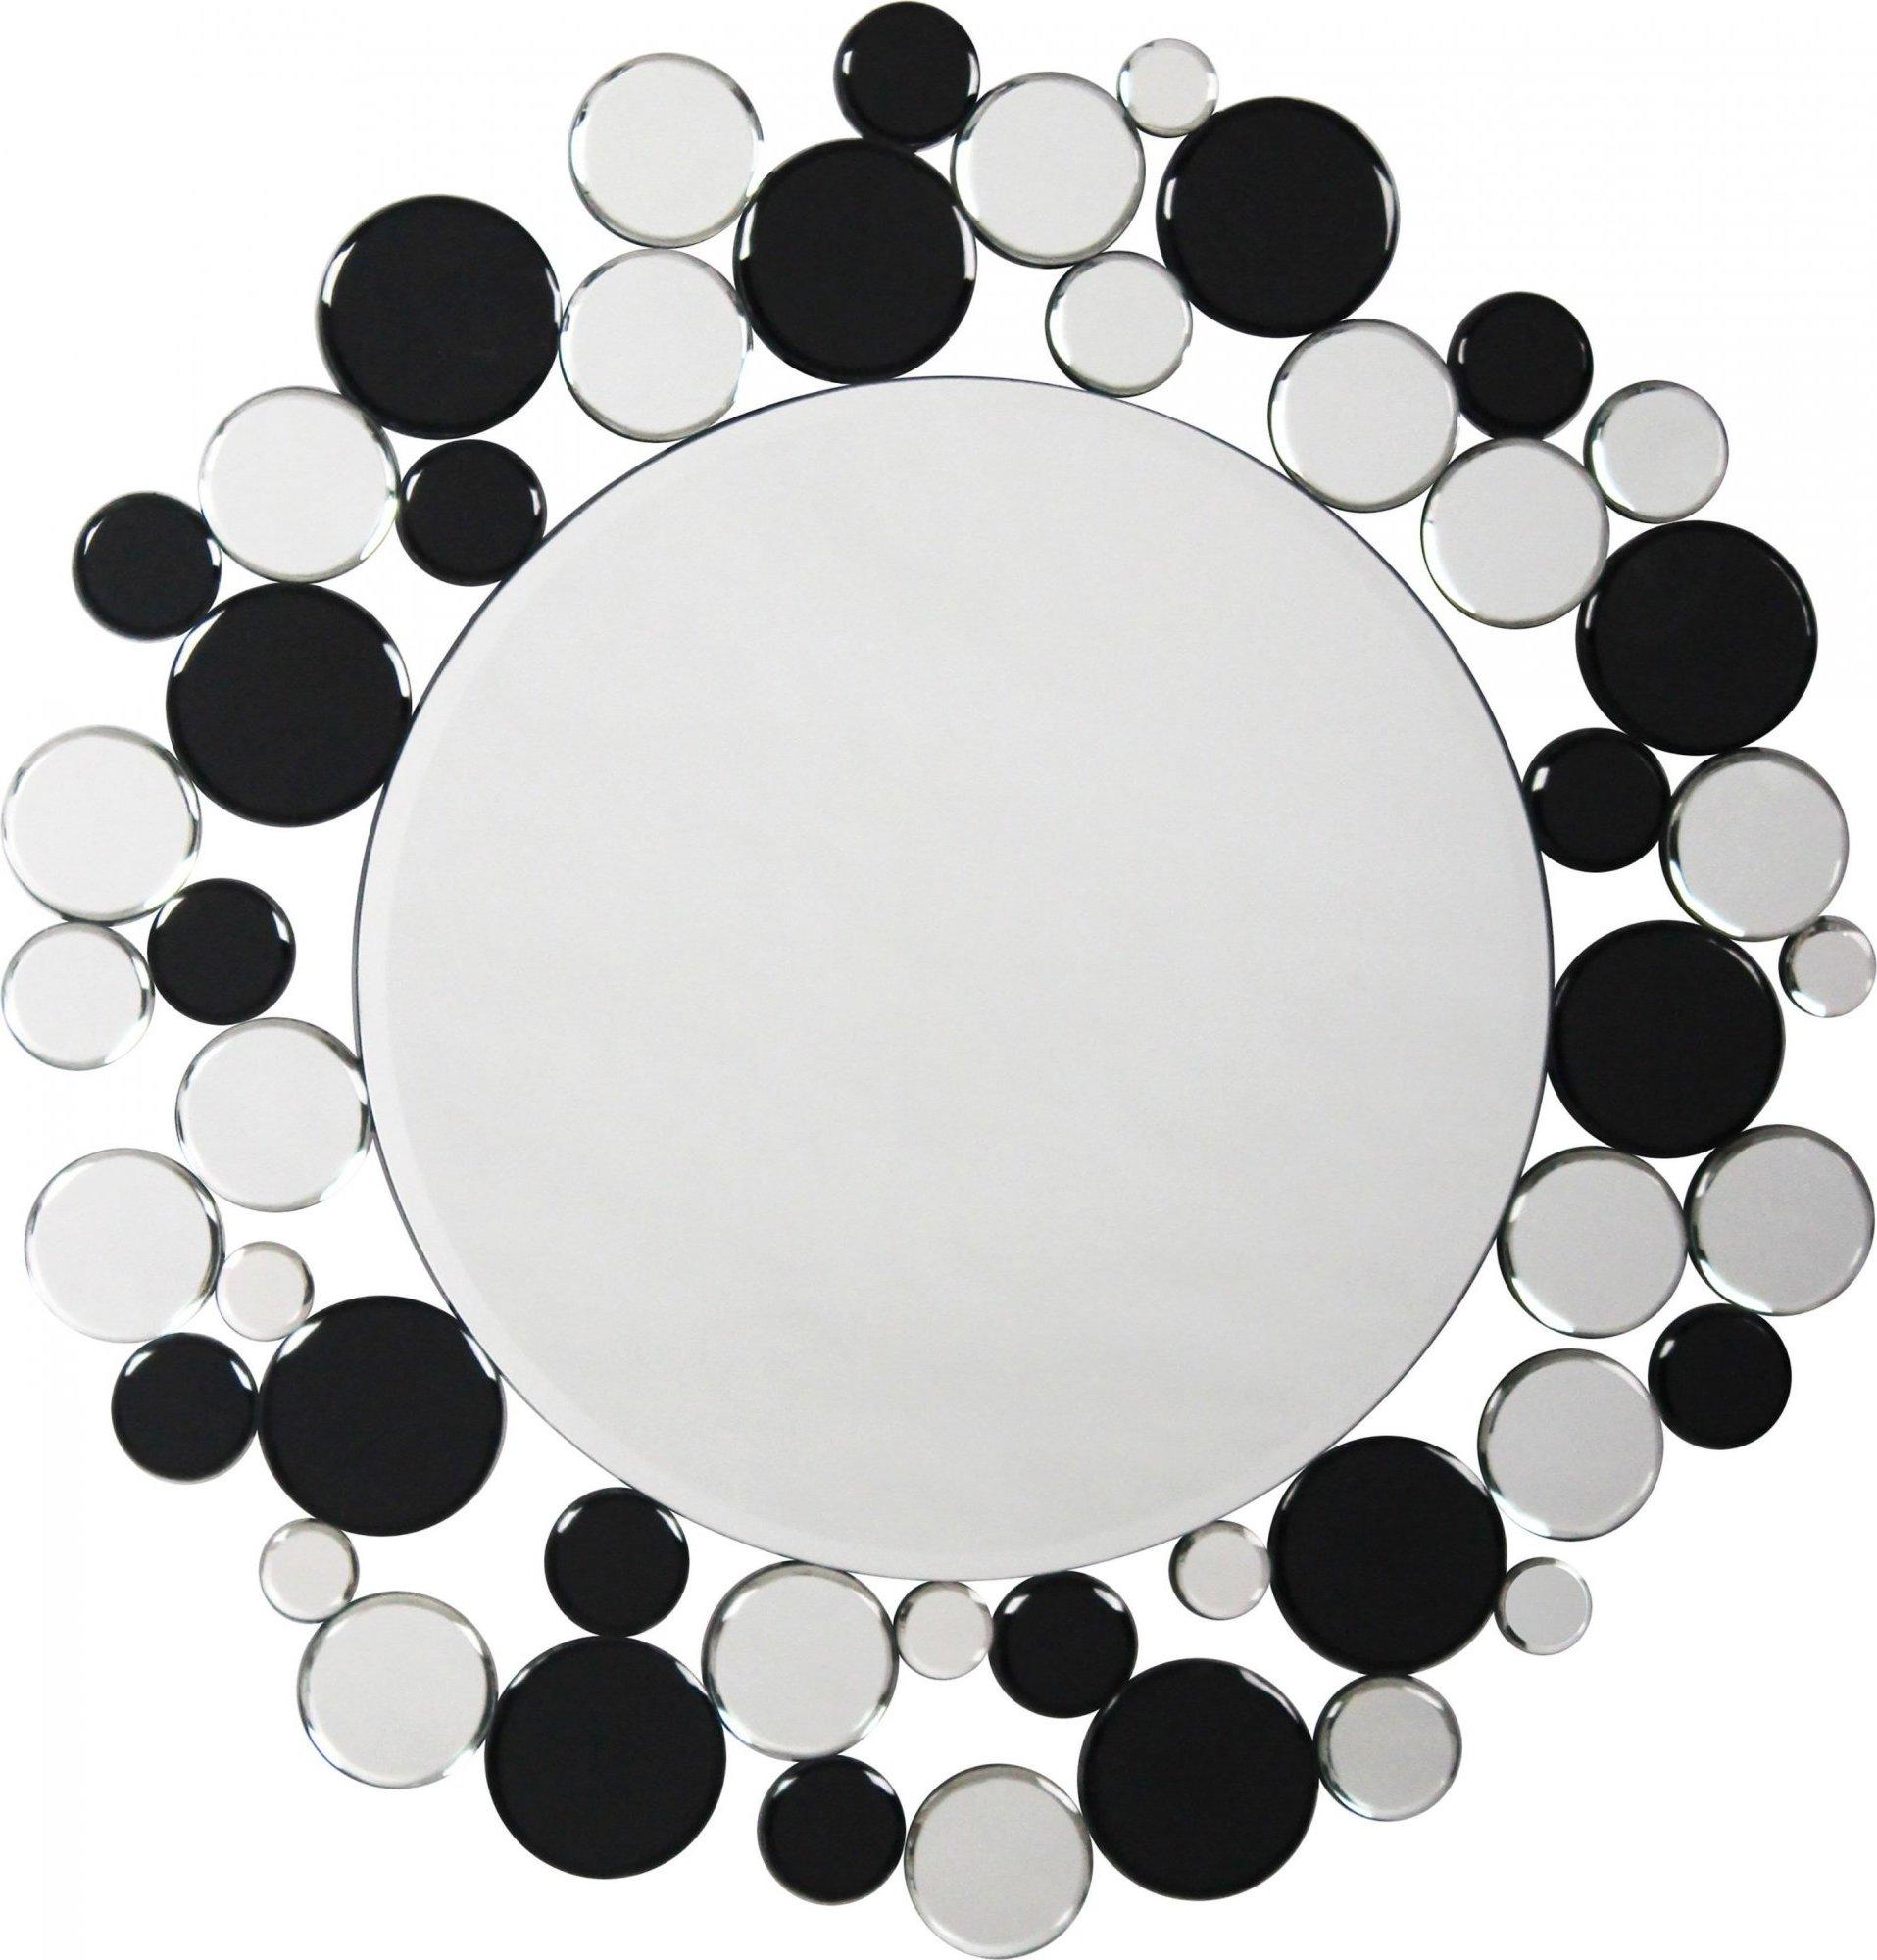 Miroir mural argent et noir d80